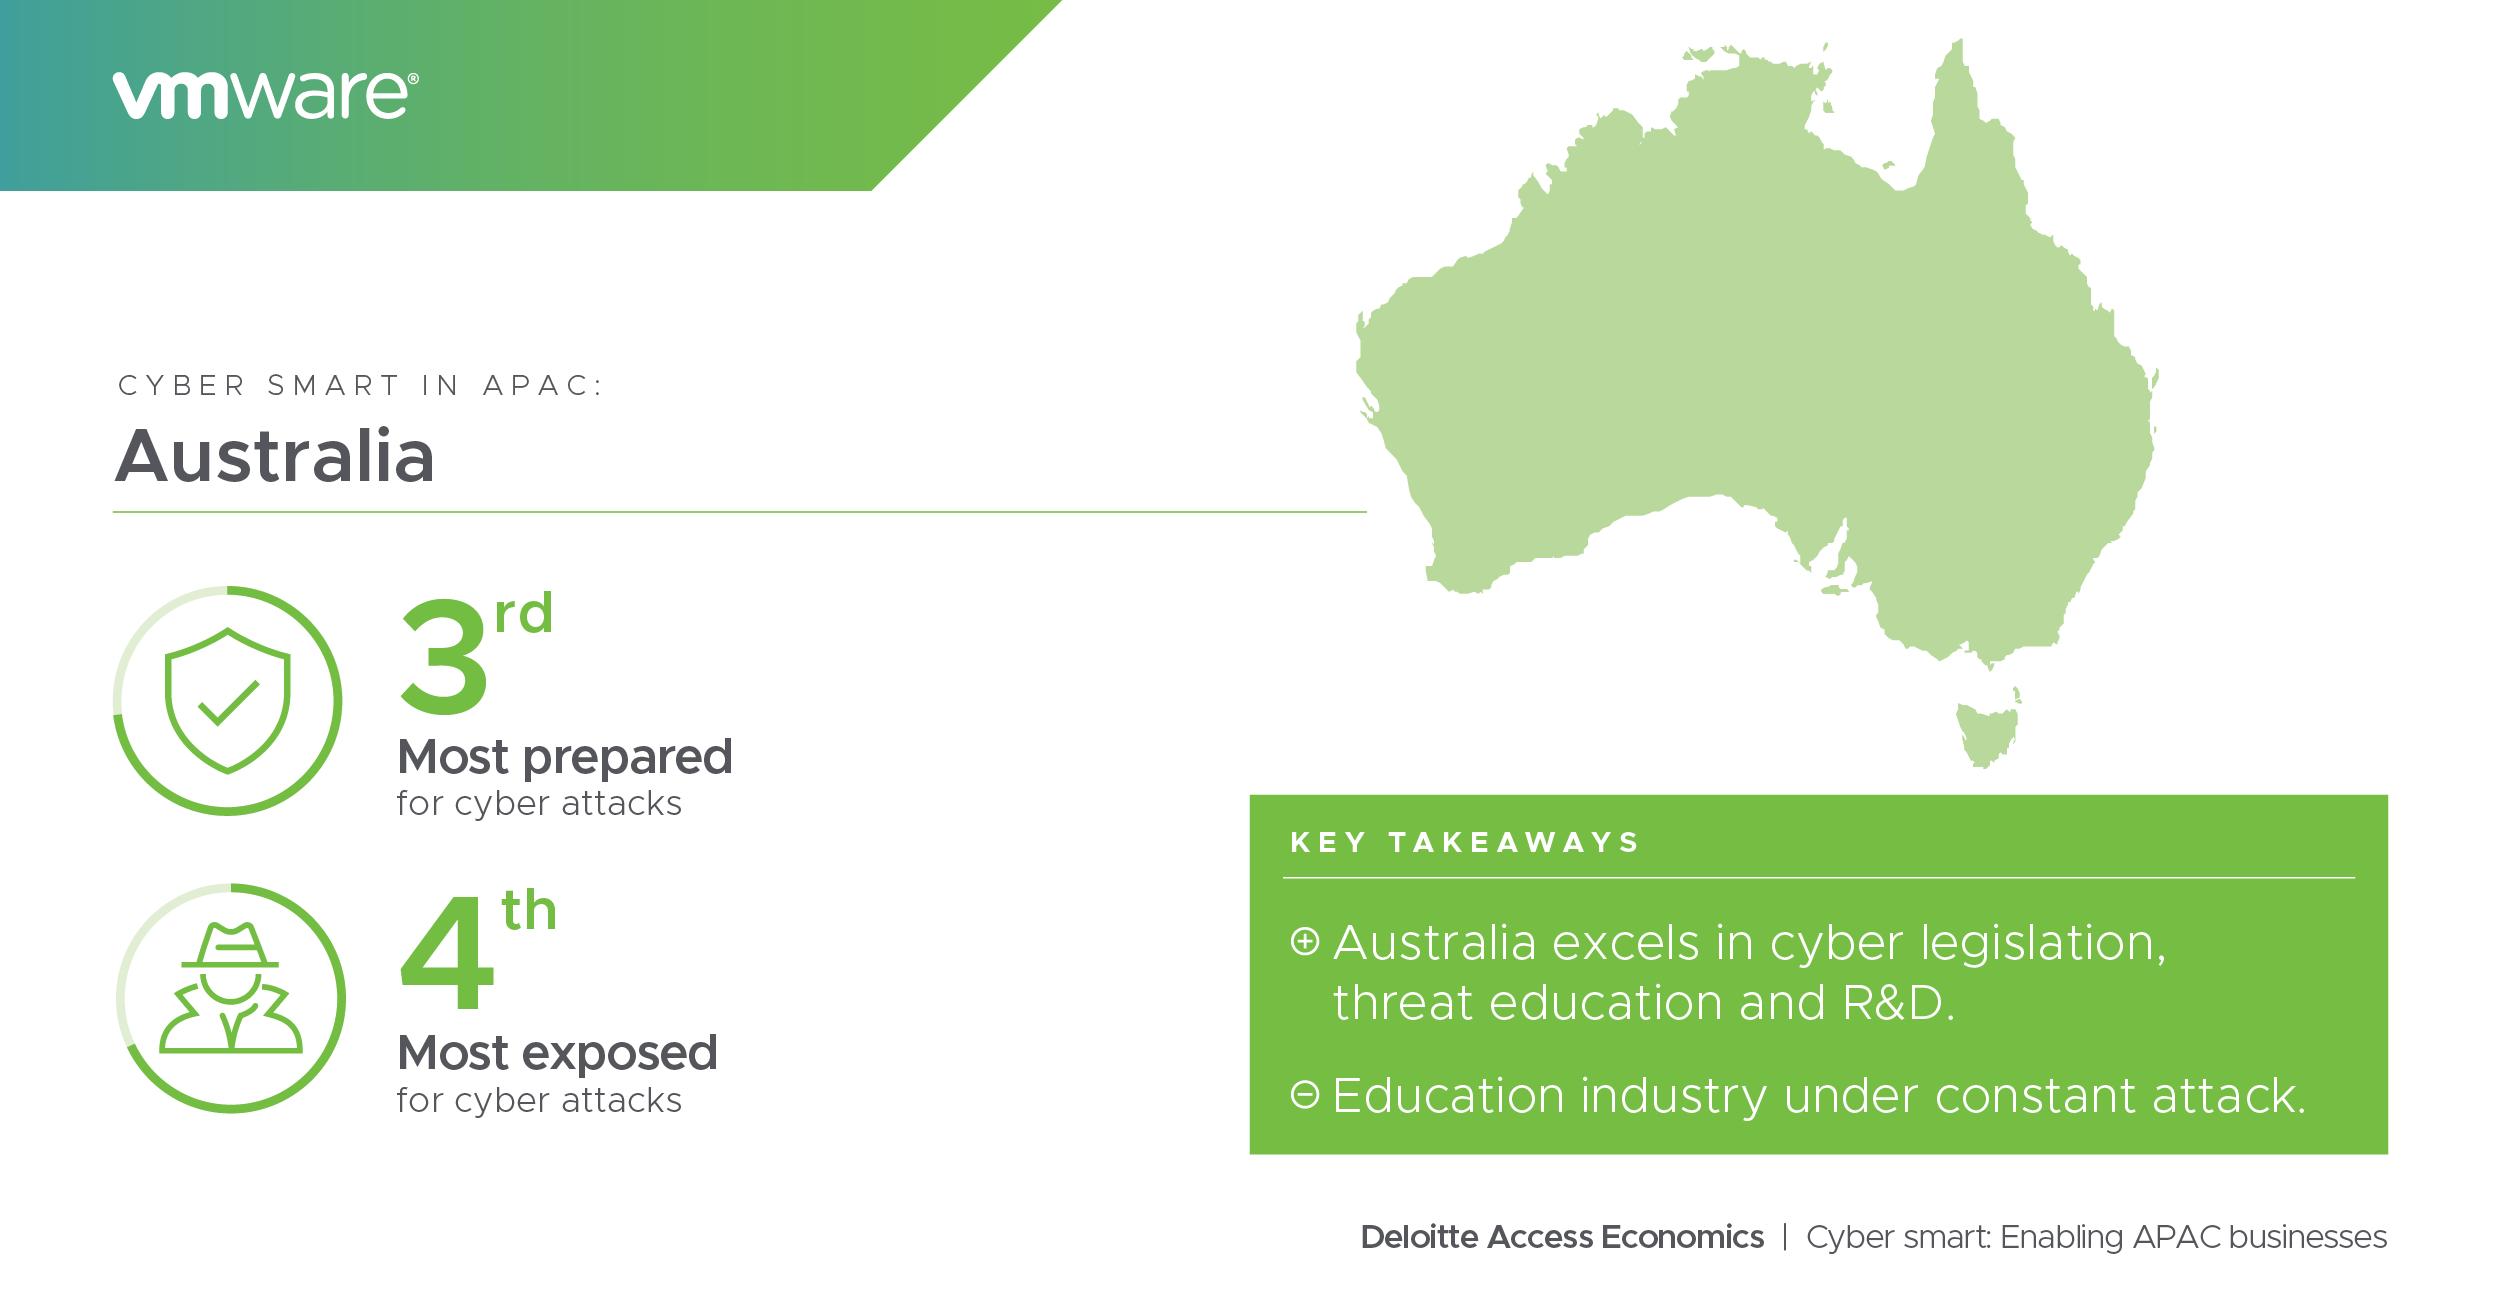 Cybersecurity in Australia